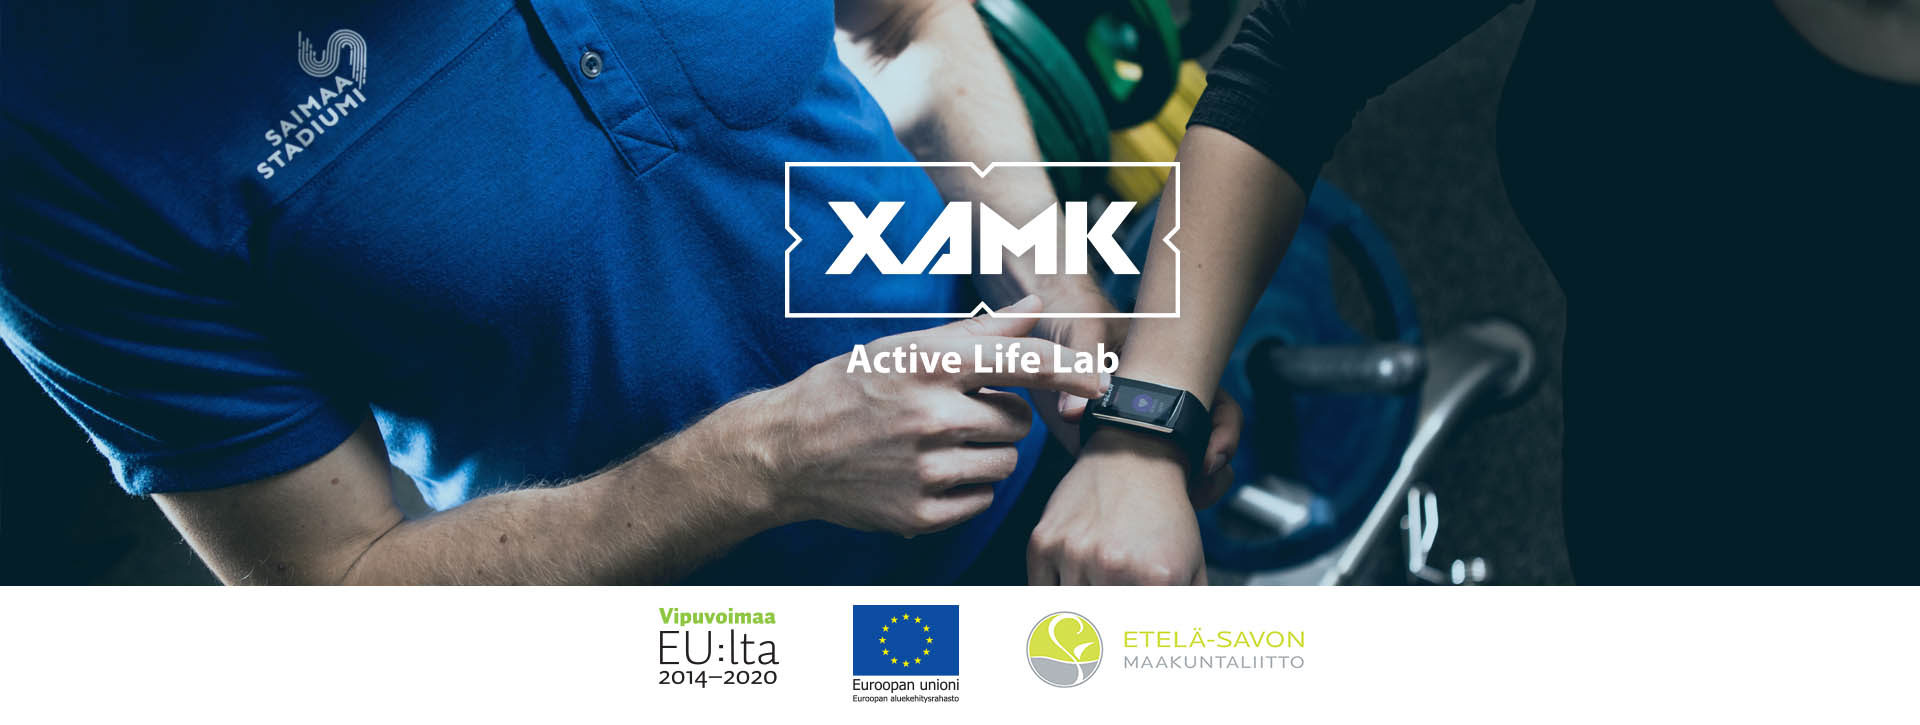 Xamk Active Life Lab